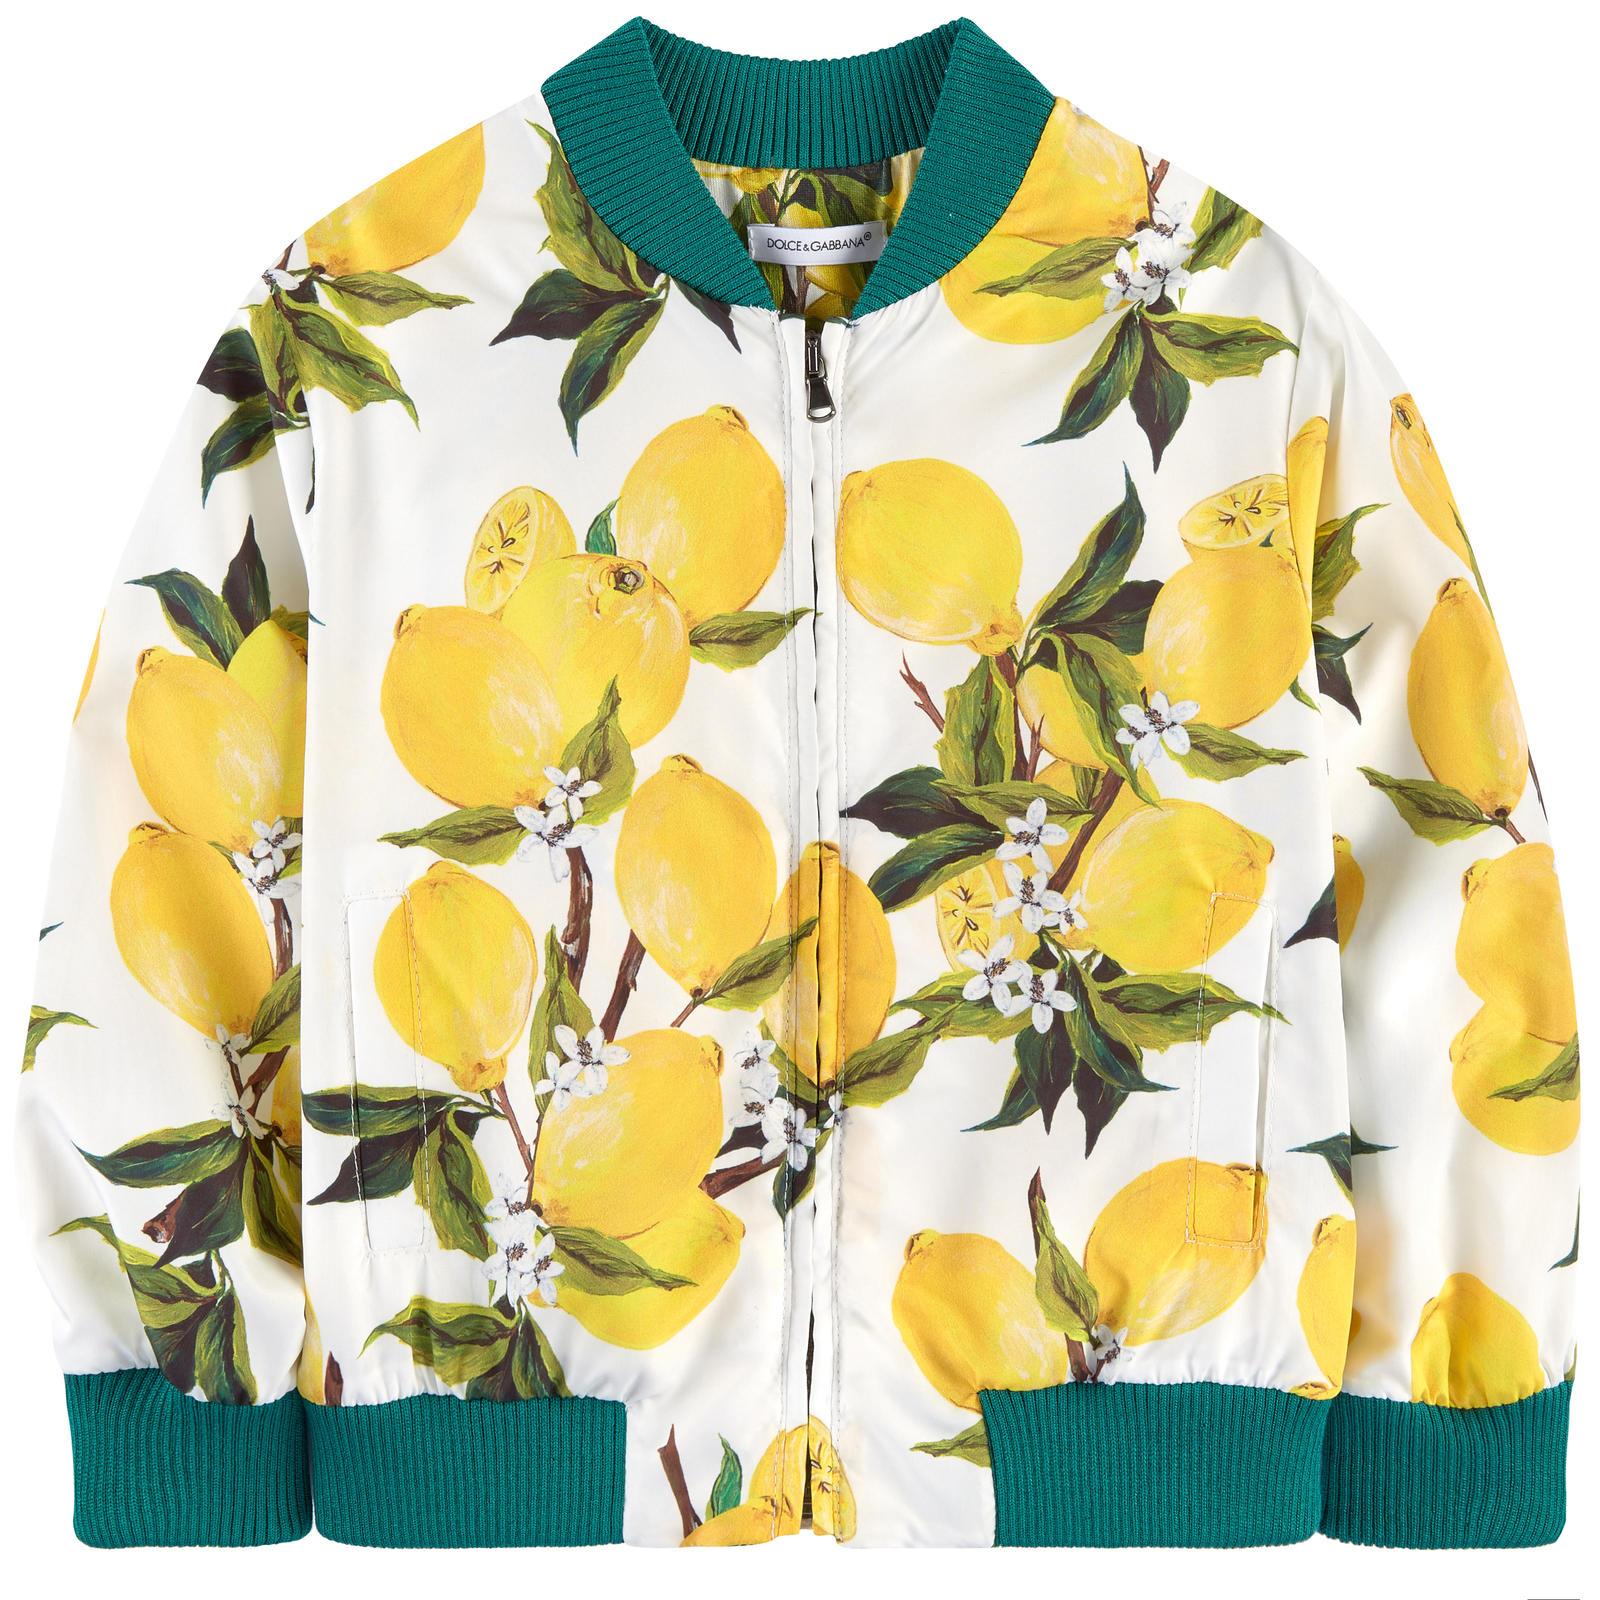 Dolce & Gabbana Lemon Print Jacket